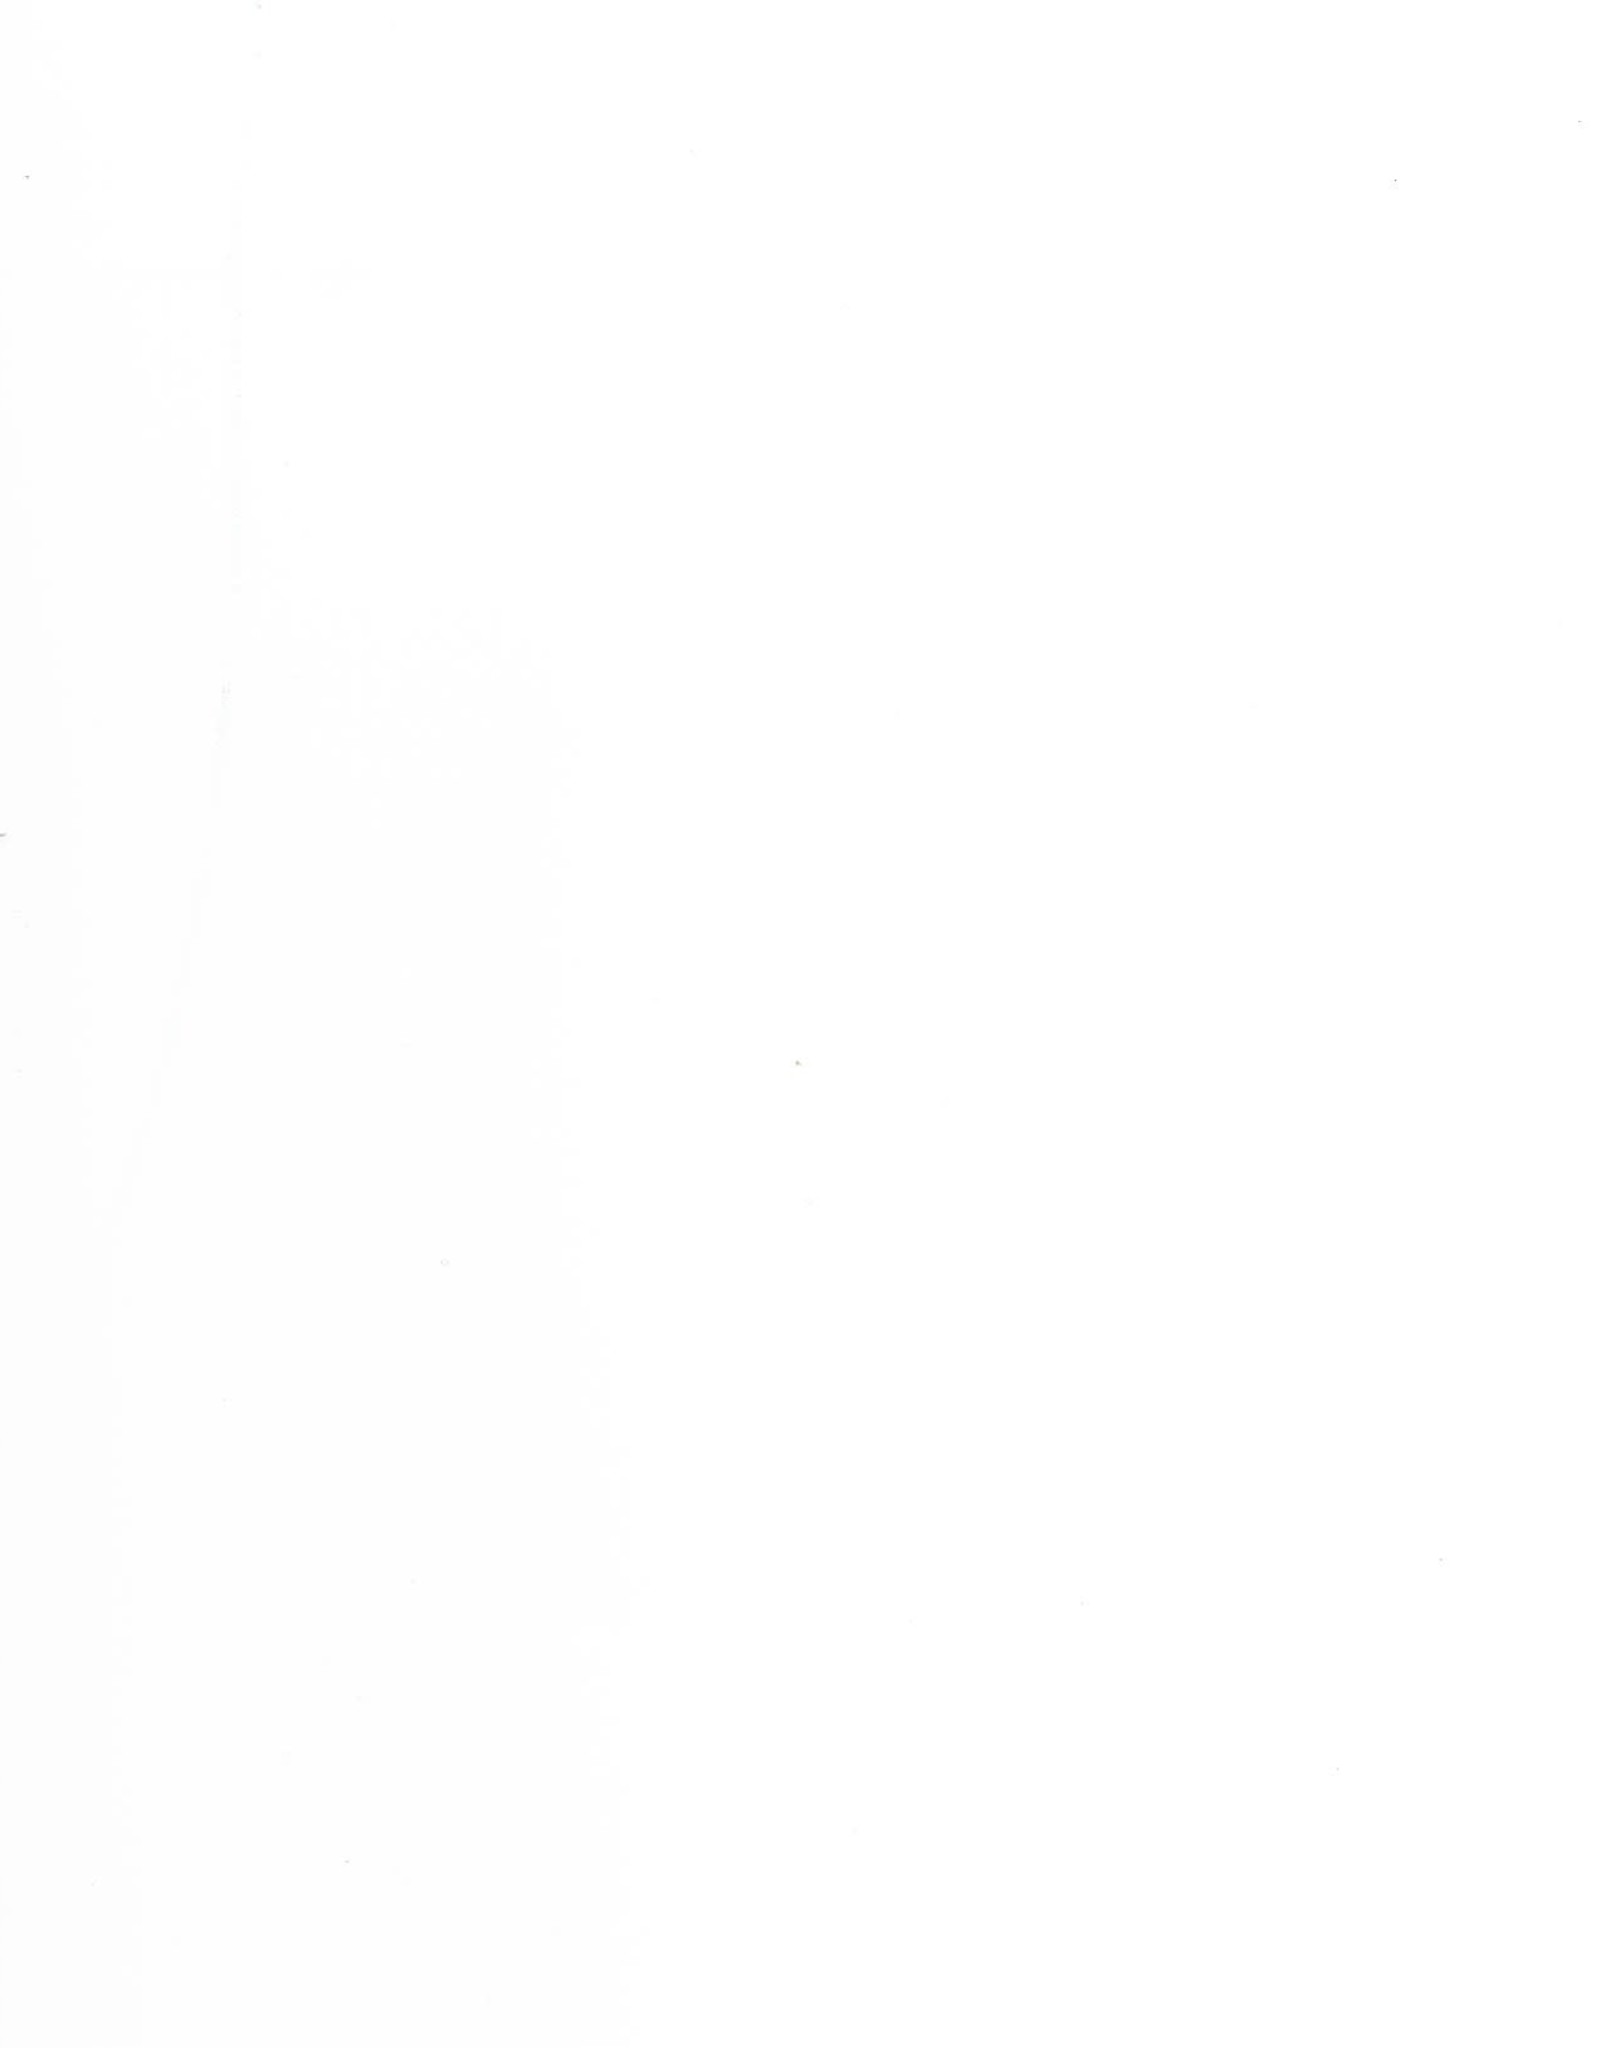 "Yupo, Translucent, 104# Text, 25"" x 38"", 153gsm"